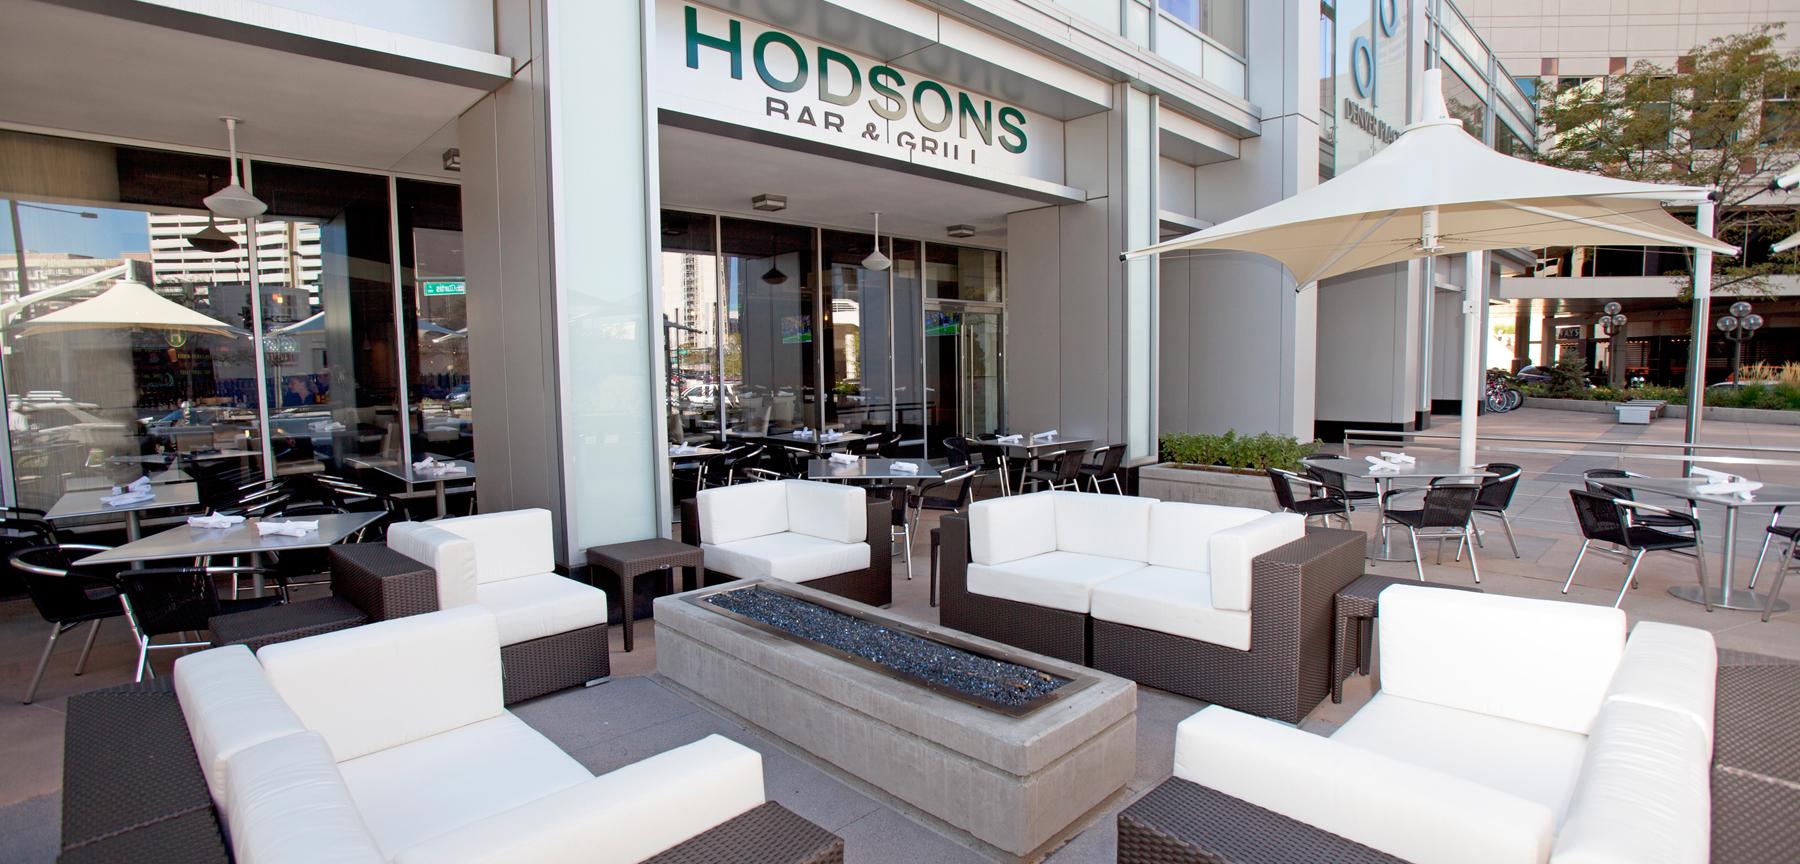 Hodson's Bar & Grill patio